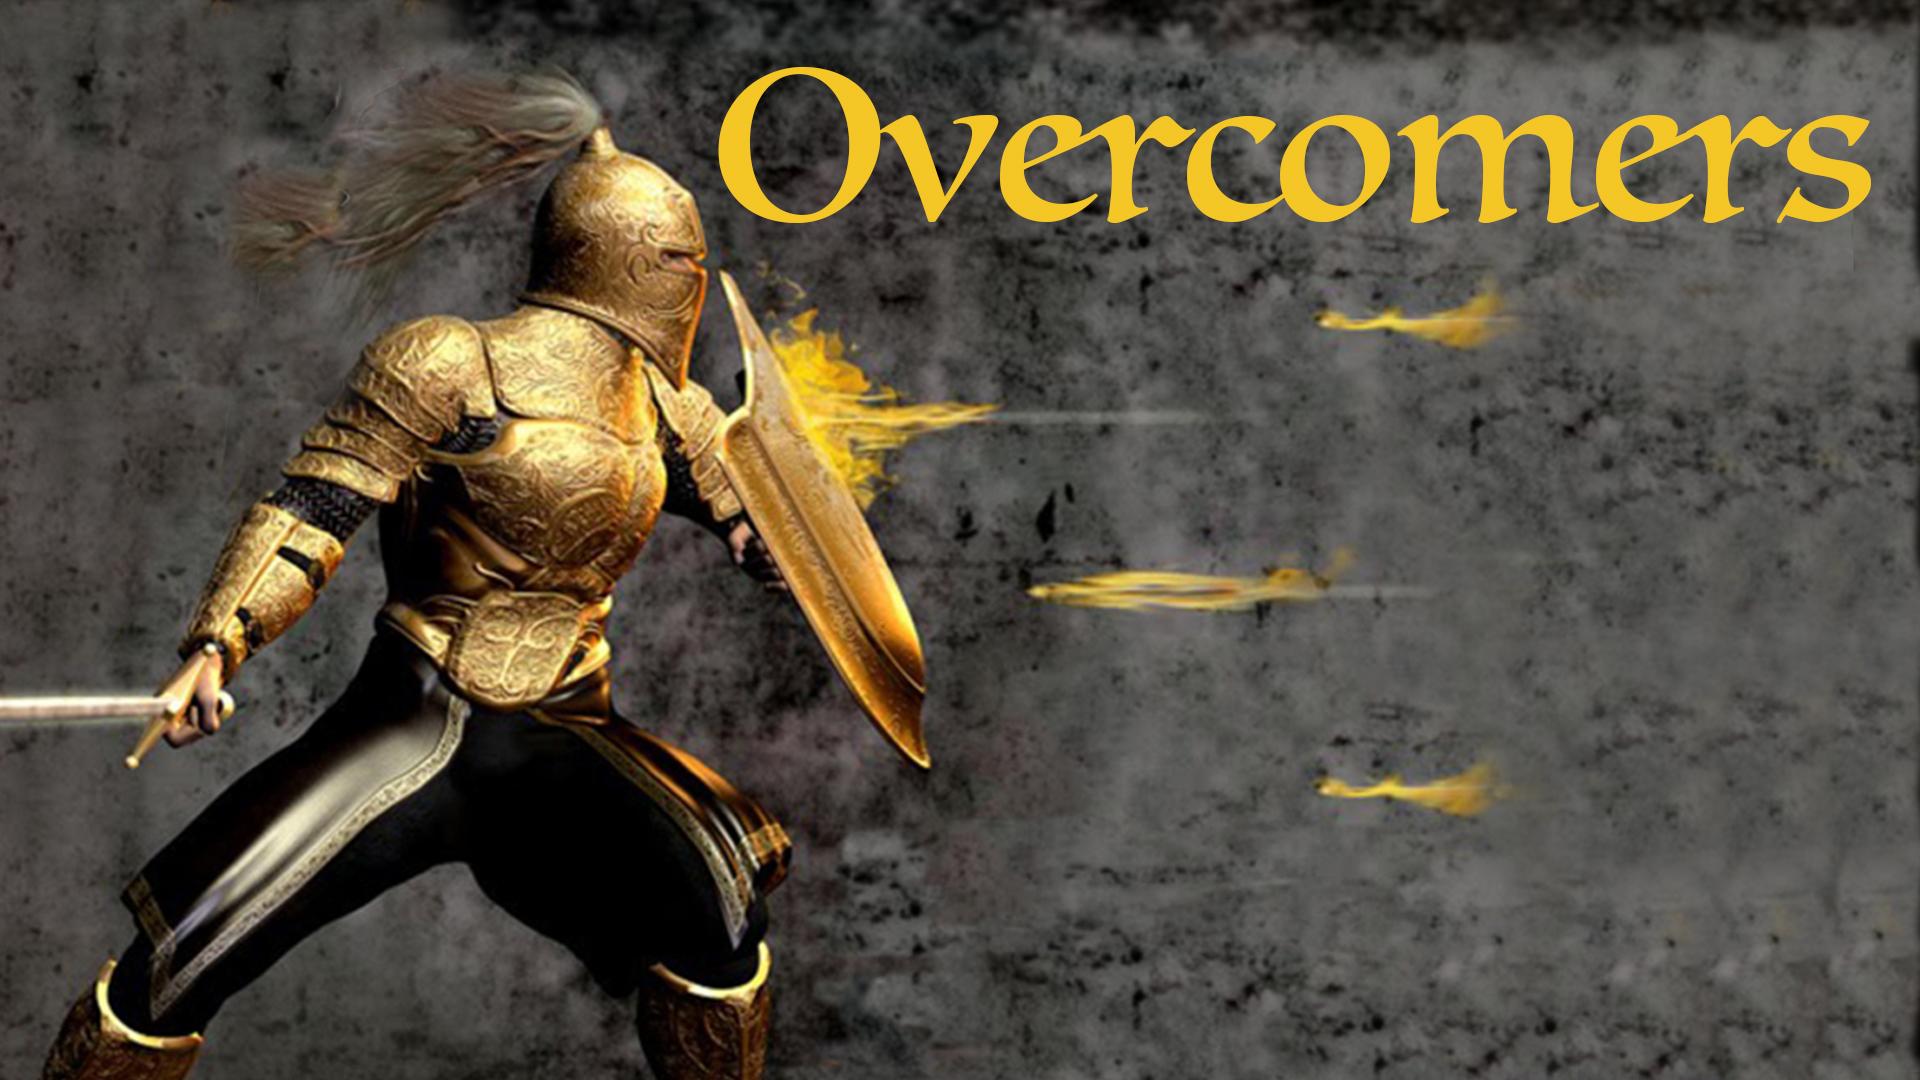 Overcomers course - 5 weeks